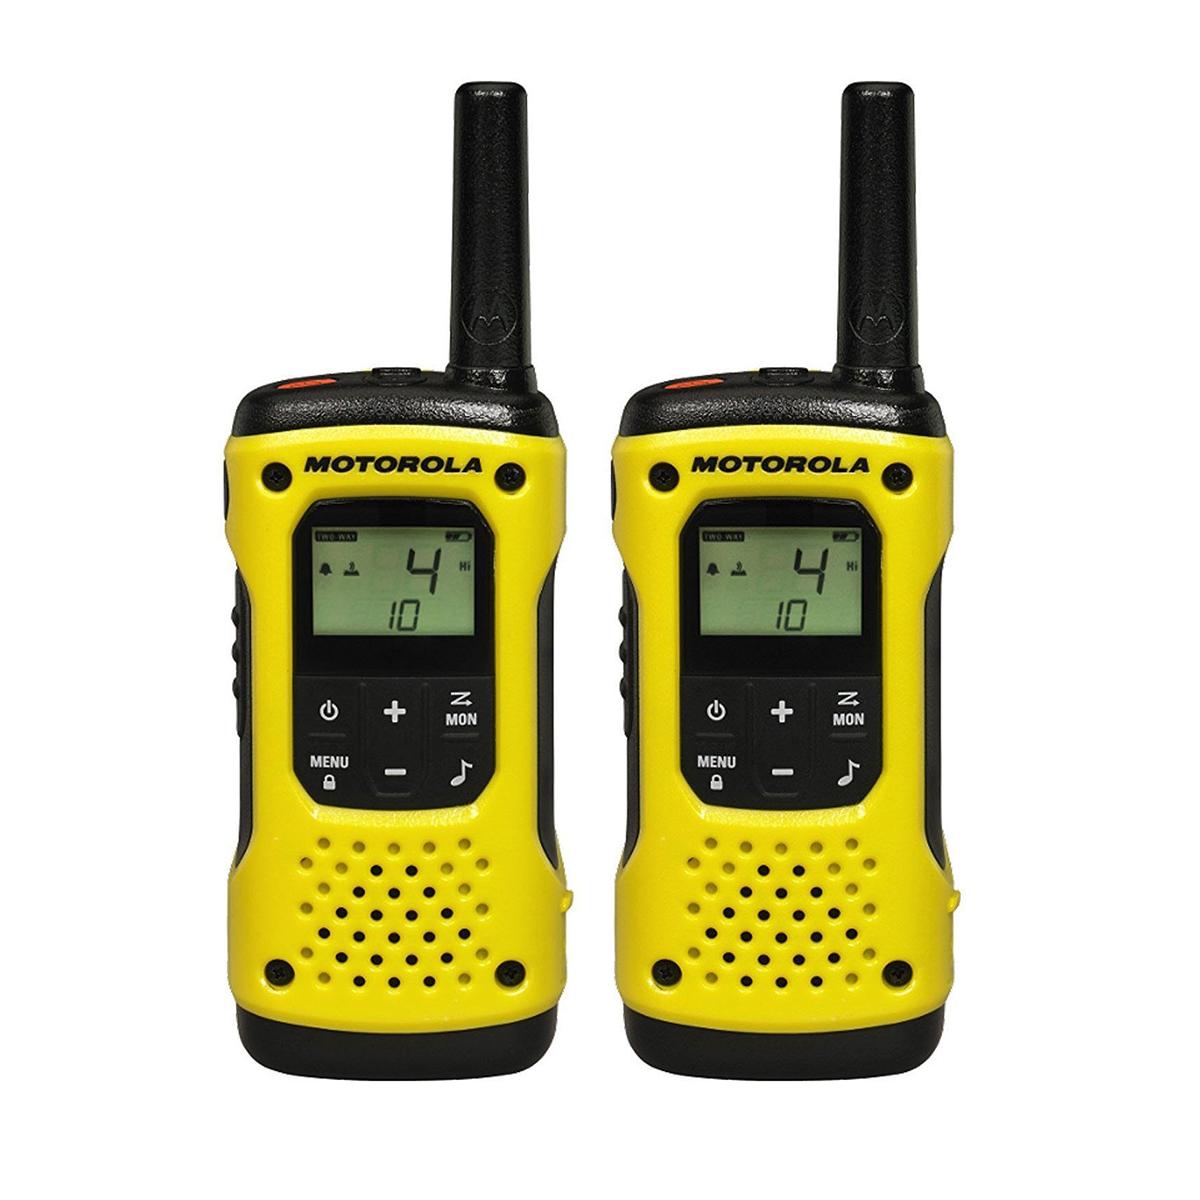 Motorola TLKR T92 H2O Walkie-Talkie Radios TWIN Pack